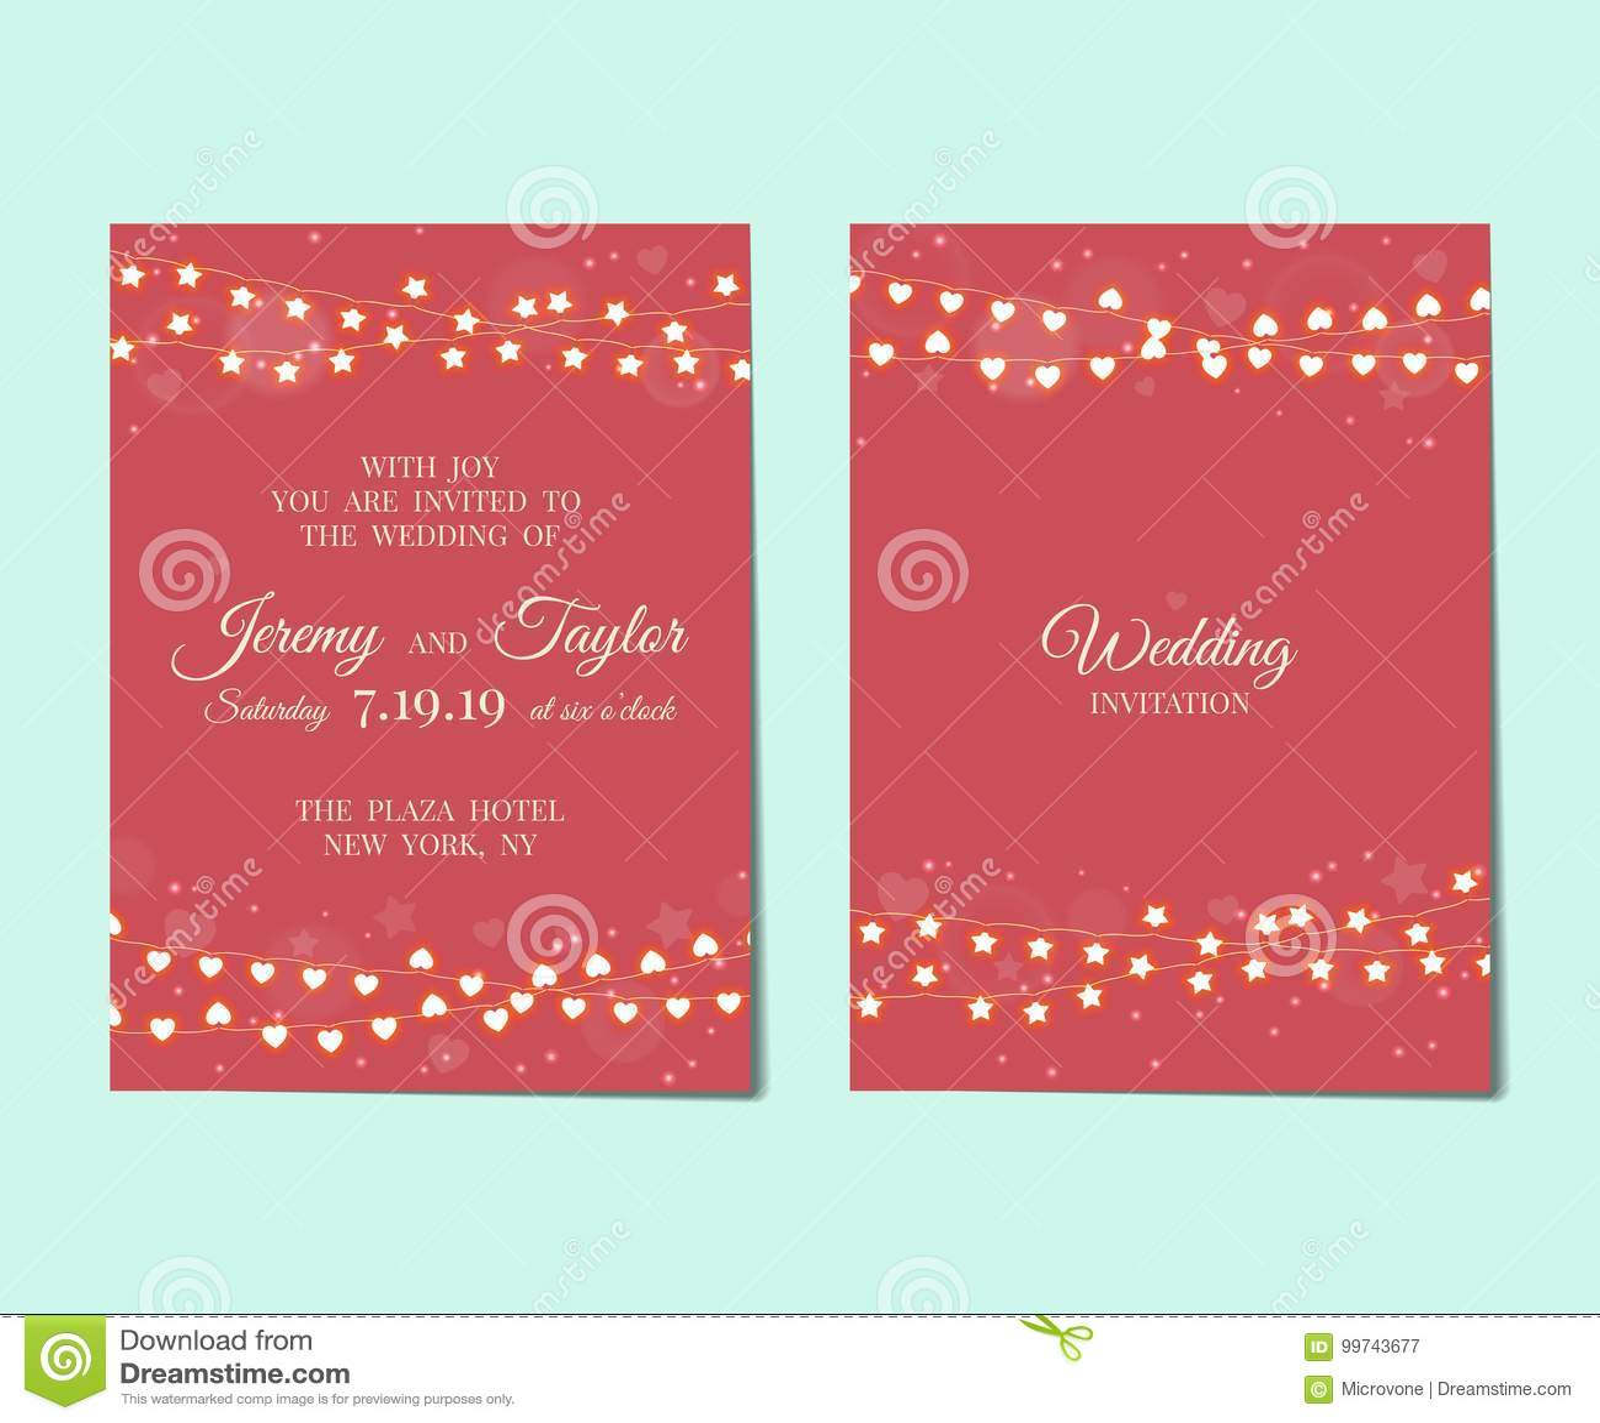 Enchanting After Wedding Party Invitations Adornment - Invitations ...